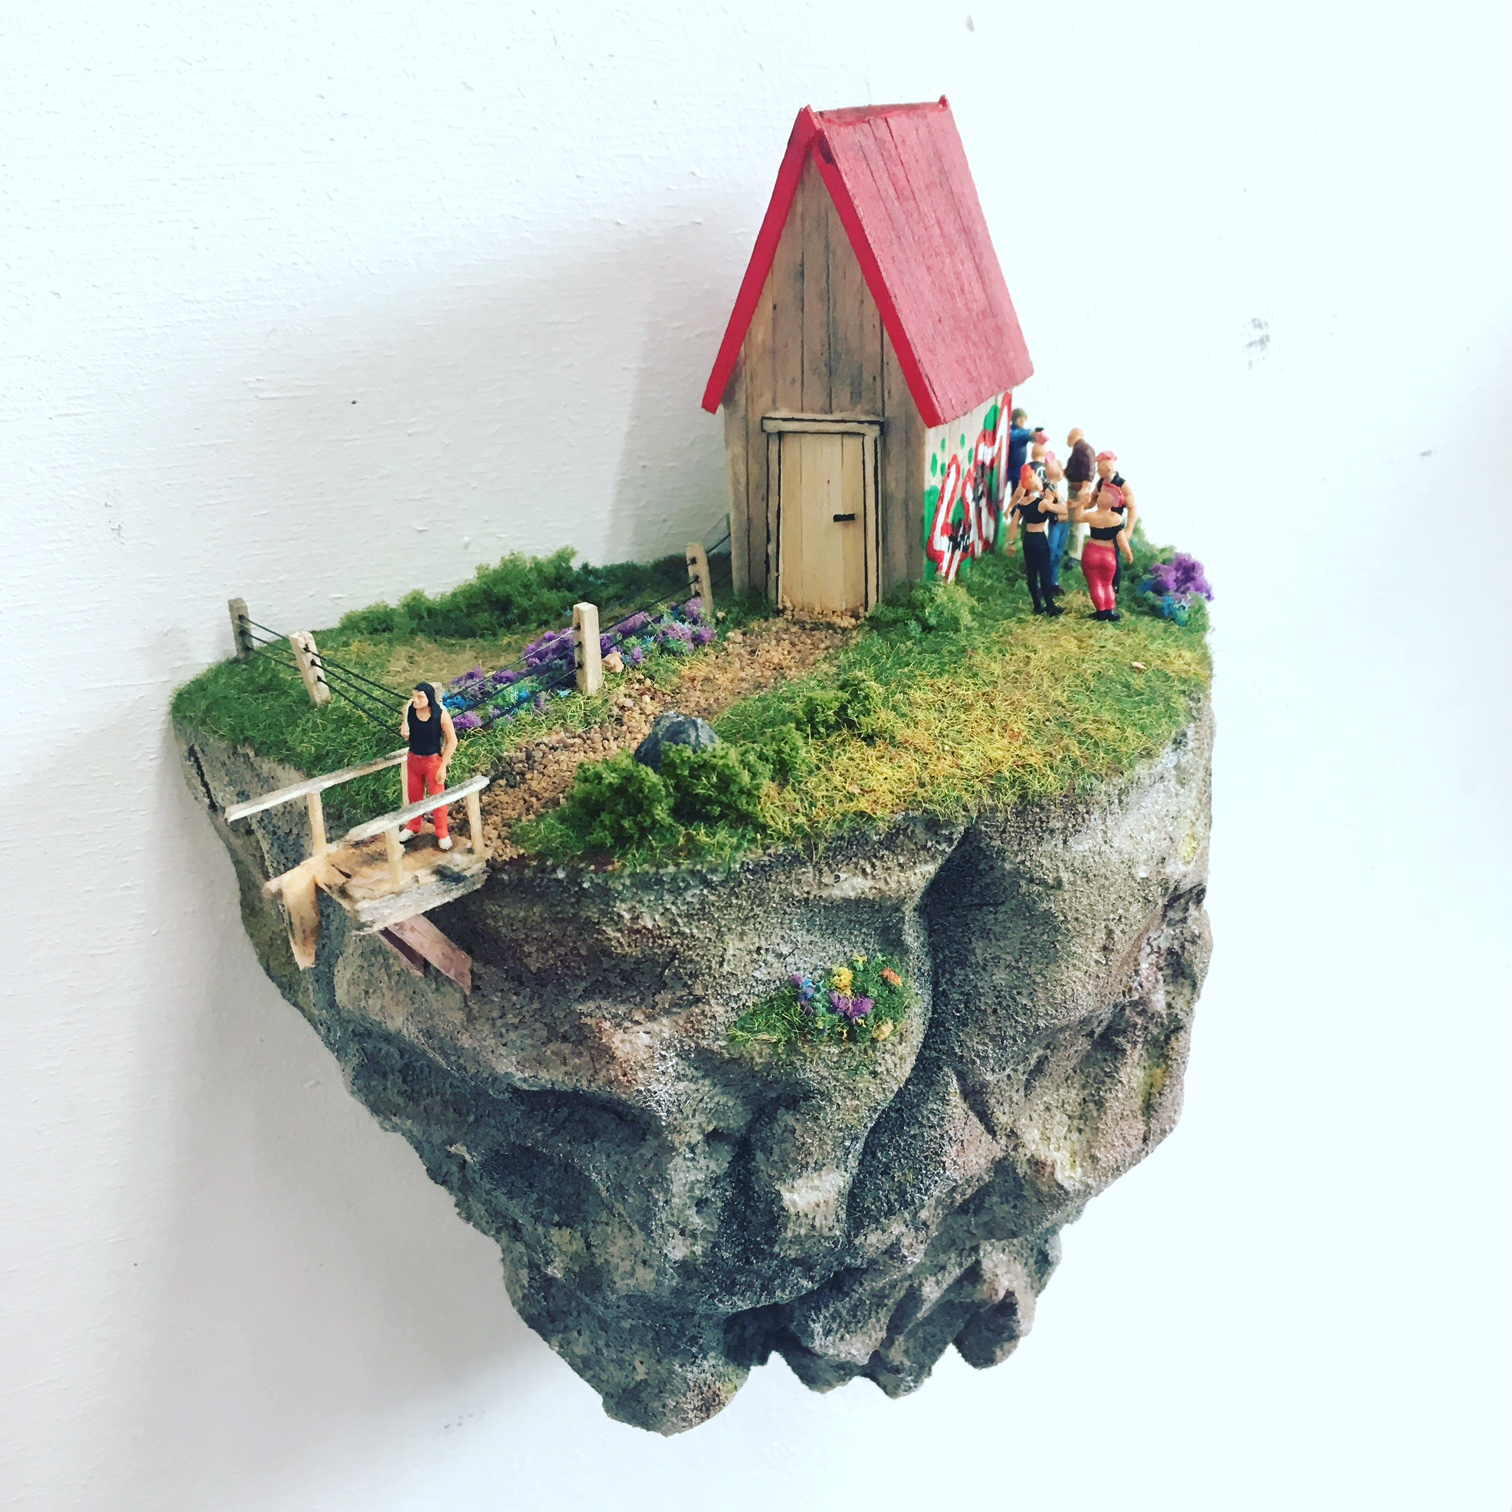 miniatuurwereld Sam Oswin Vonk